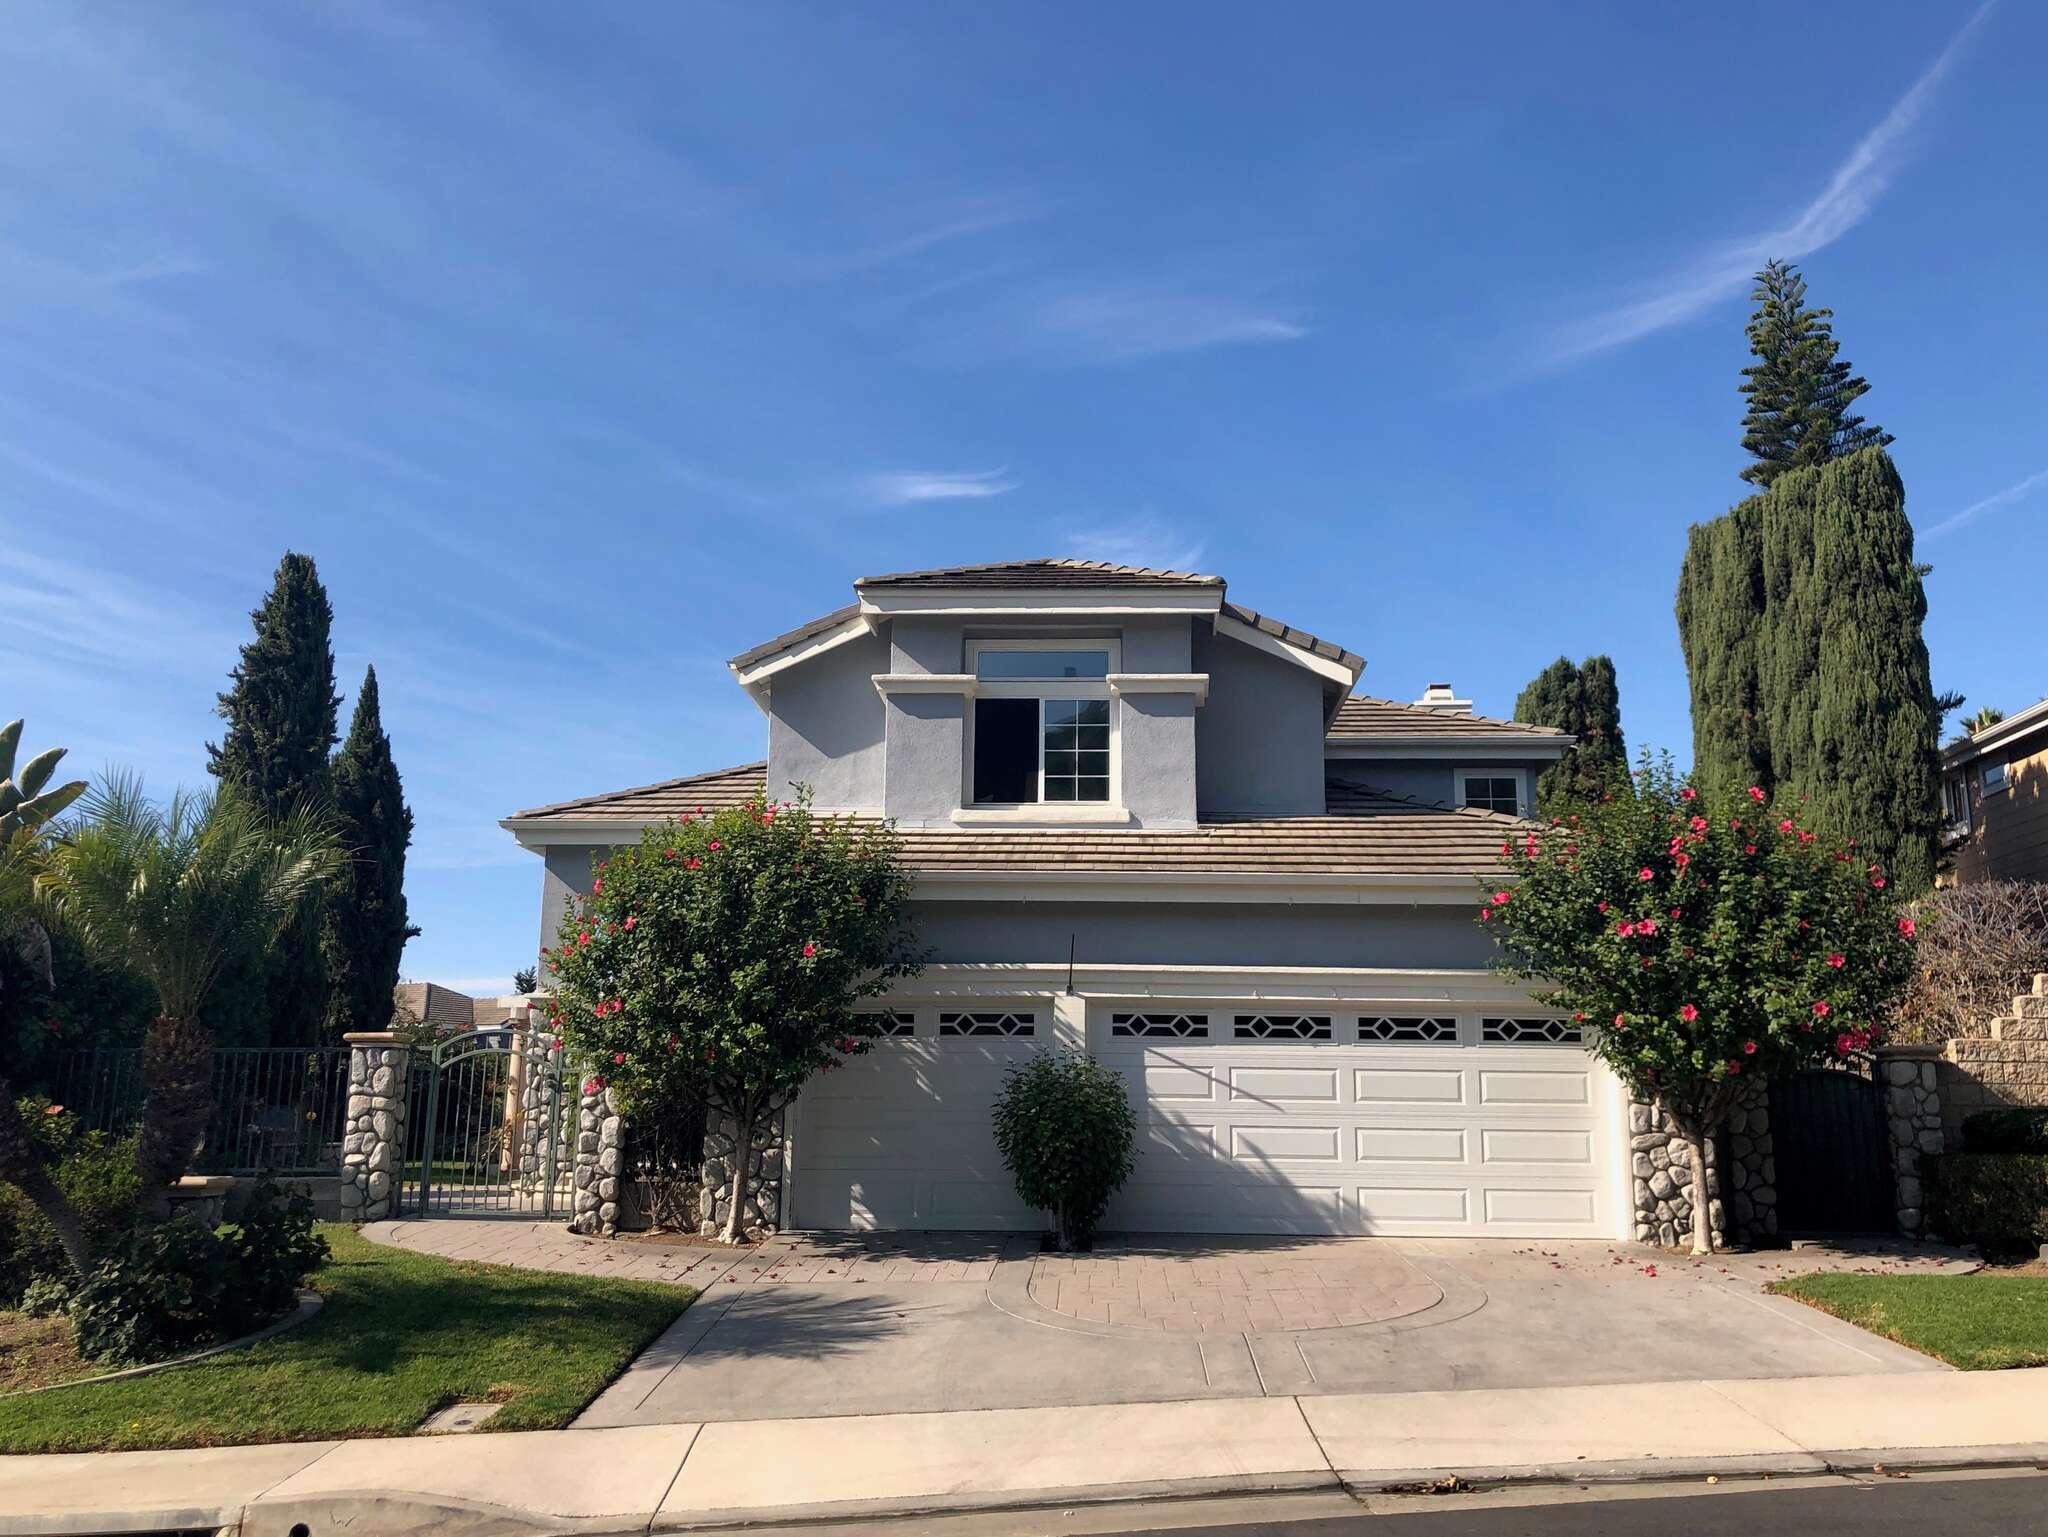 Single Family for Sale at 11 Fairlane Laguna Niguel, California 92677 United States